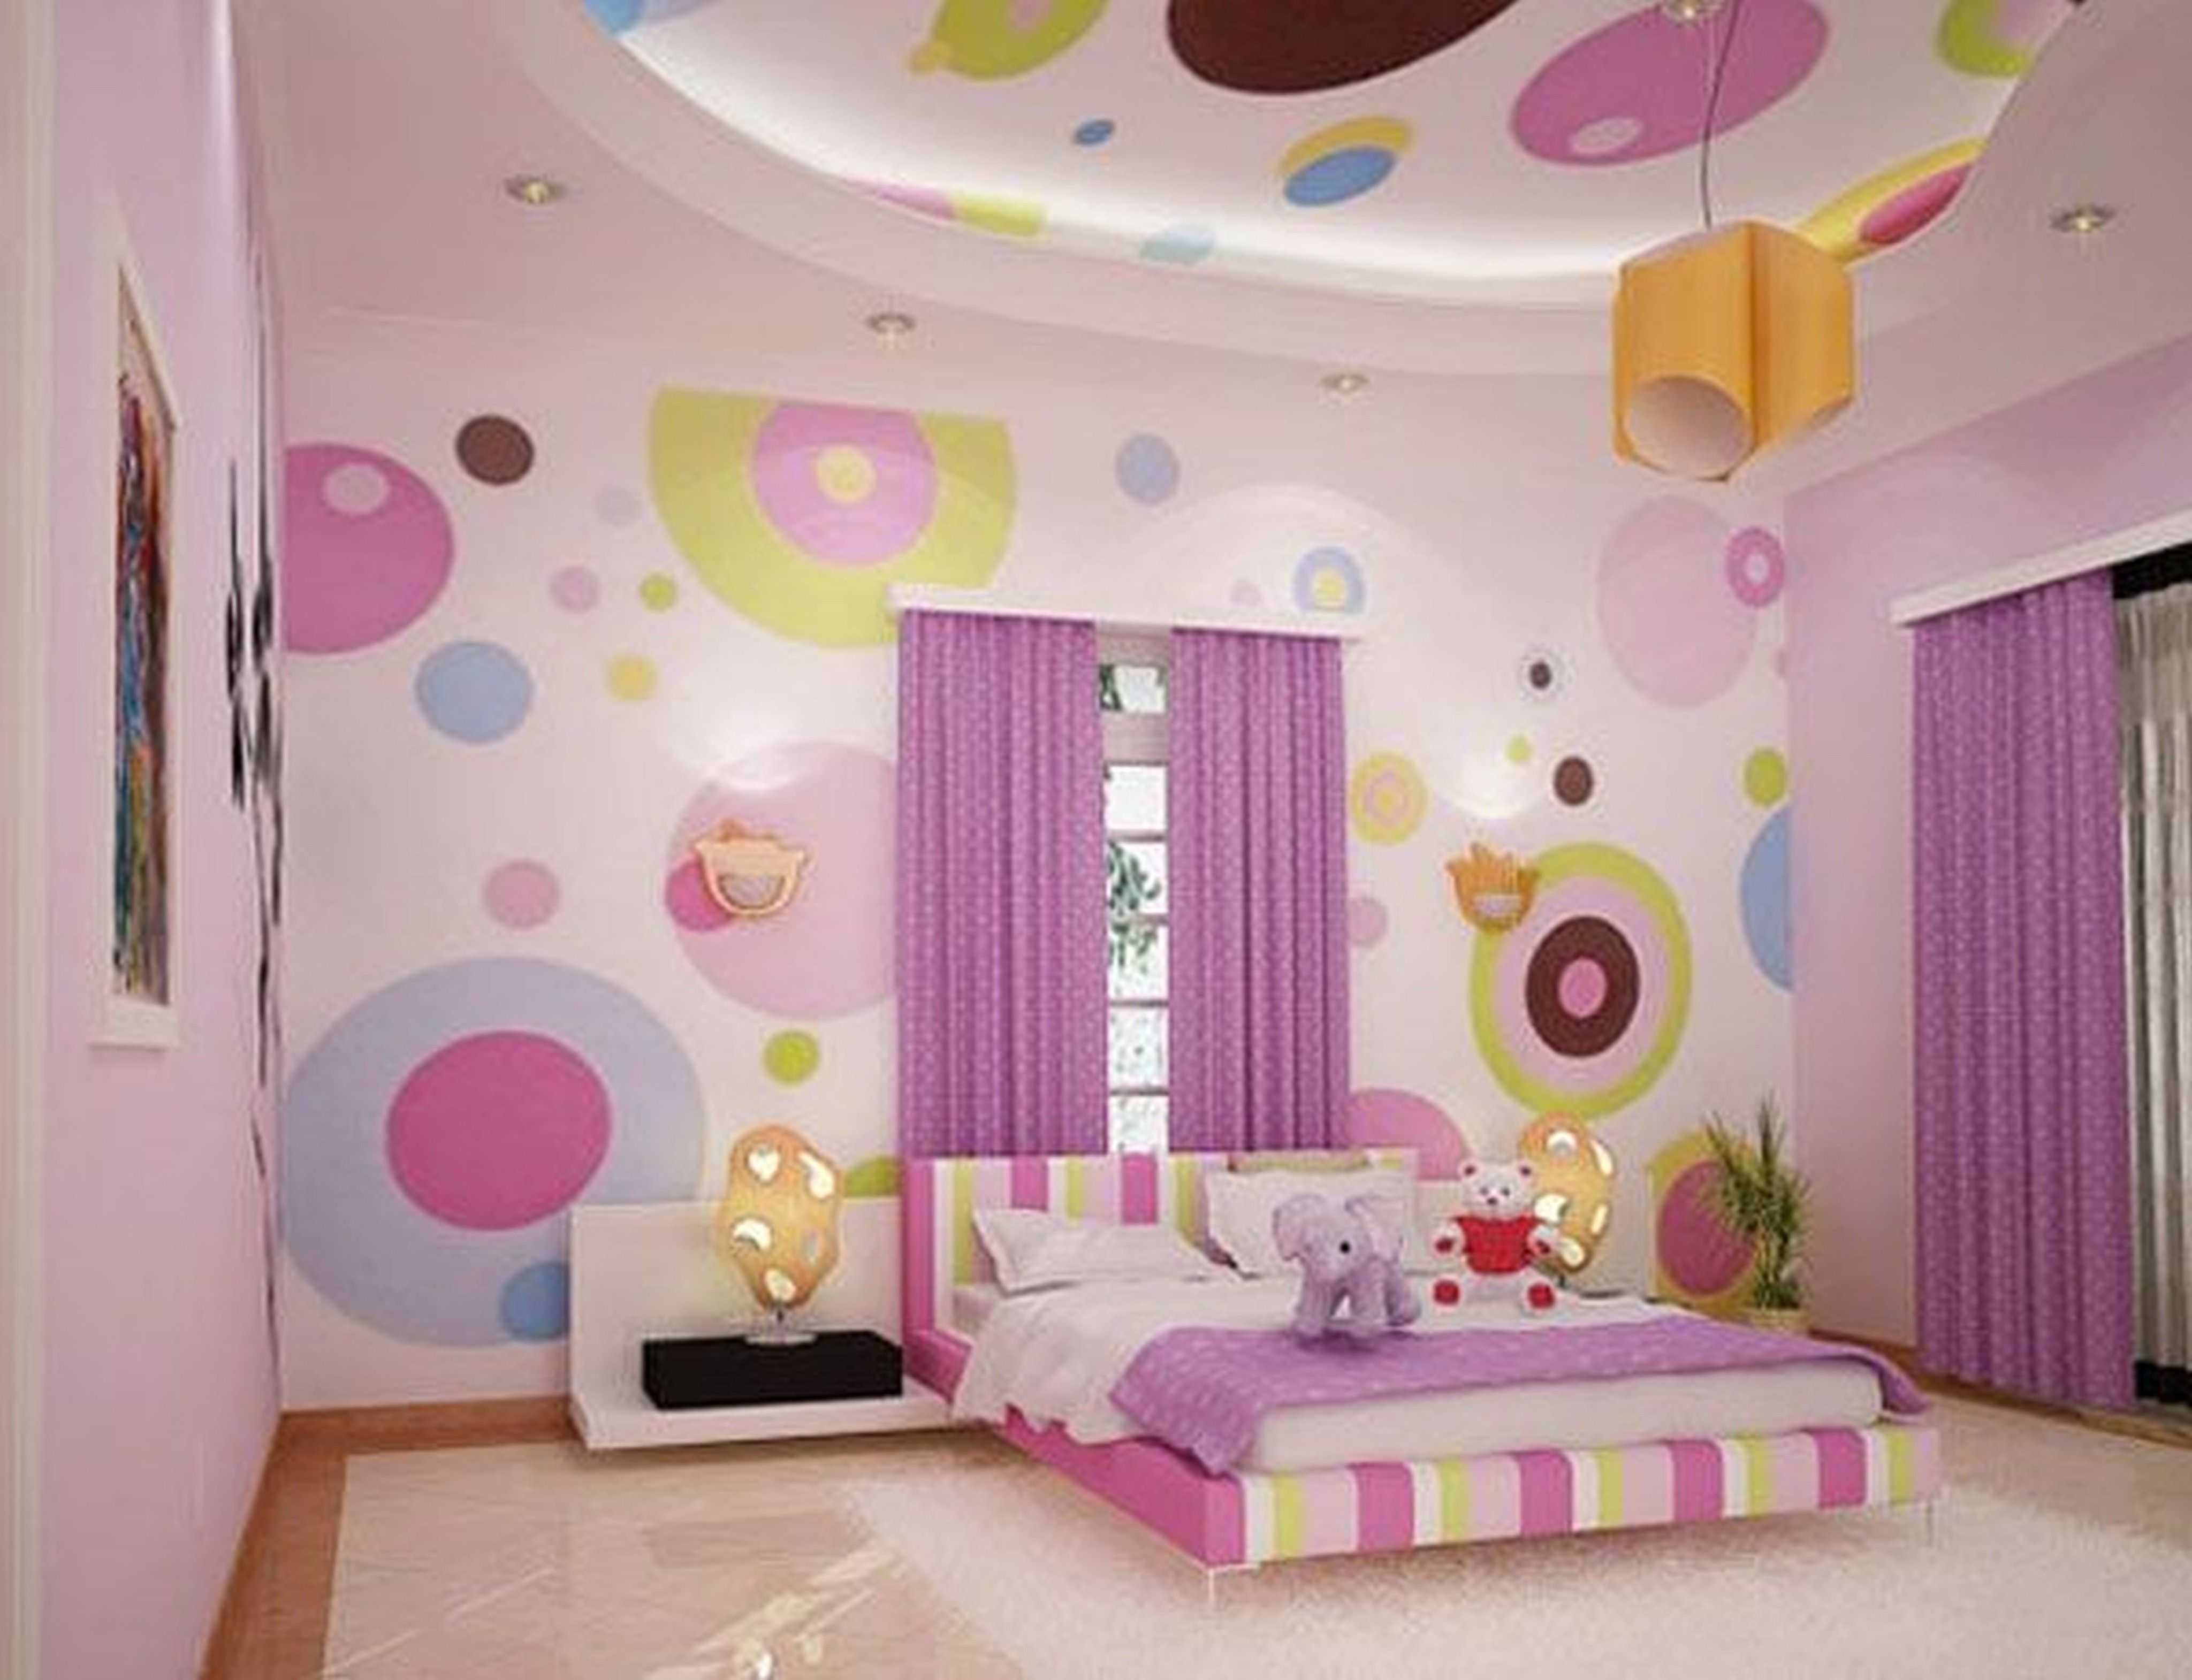 Cool Teen Wallpapers - Top Free Cool Teen Backgrounds - WallpaperAccess